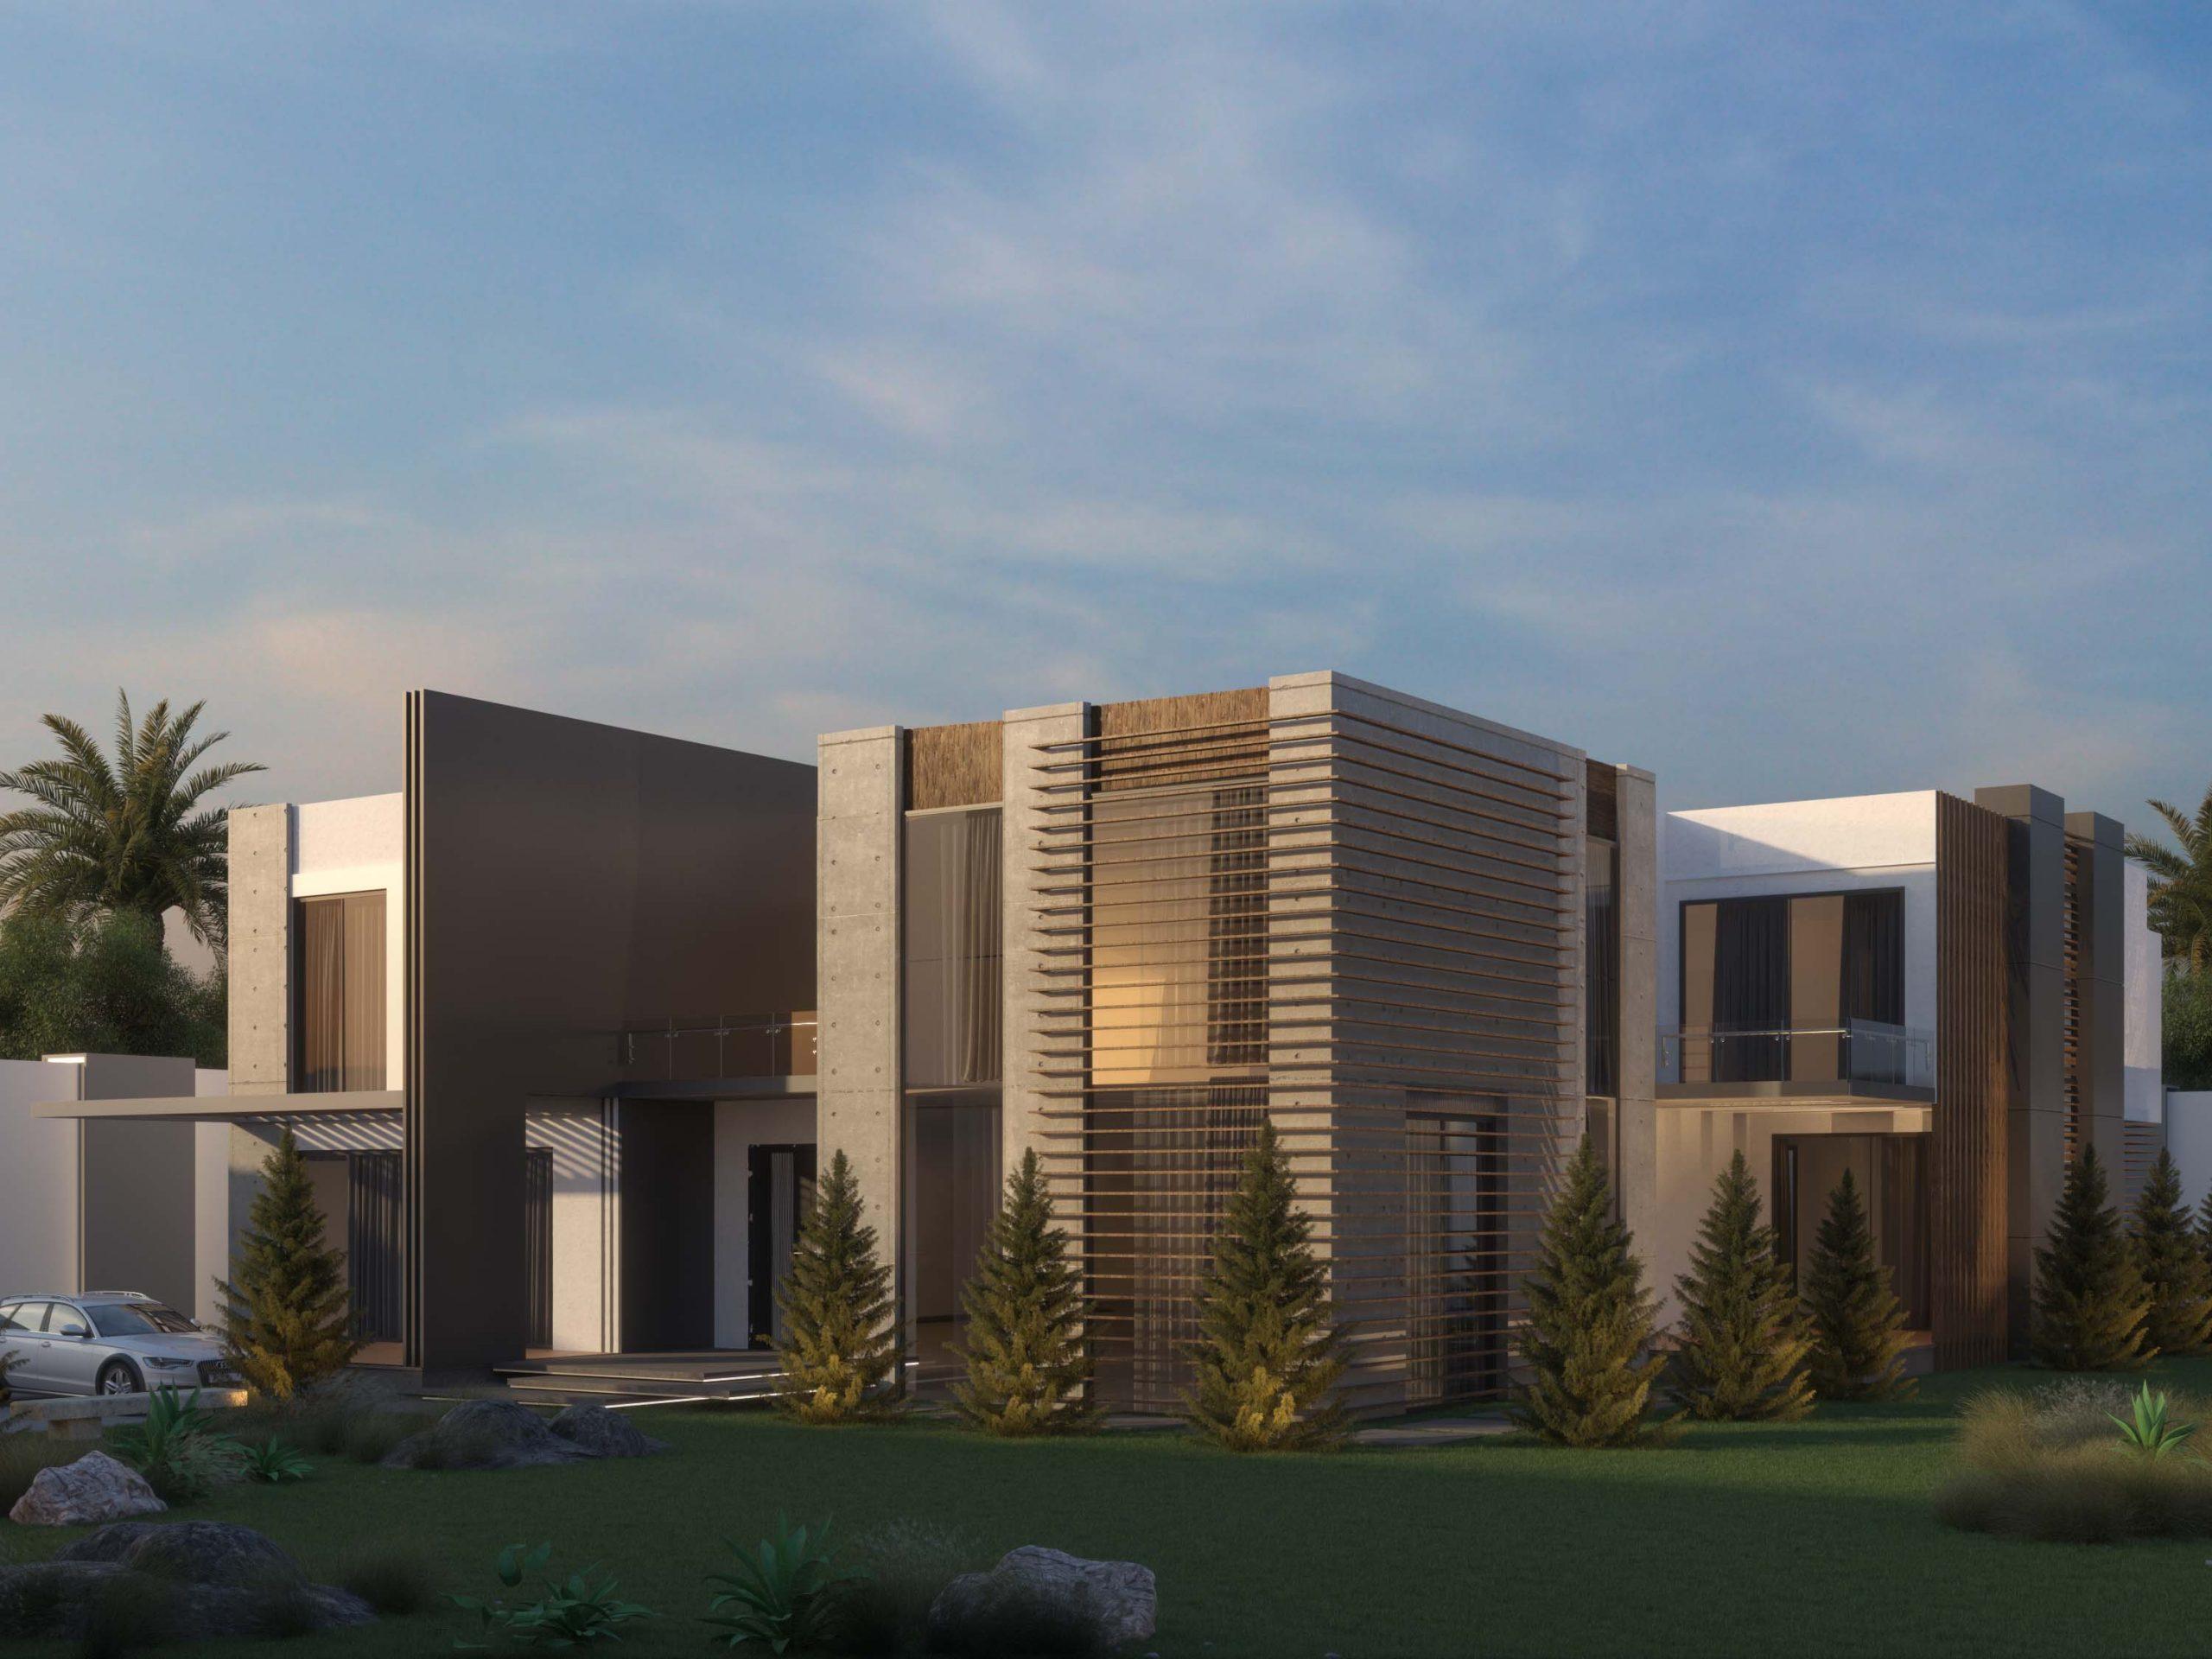 vill modern exterior design - full view - villa - modern - design